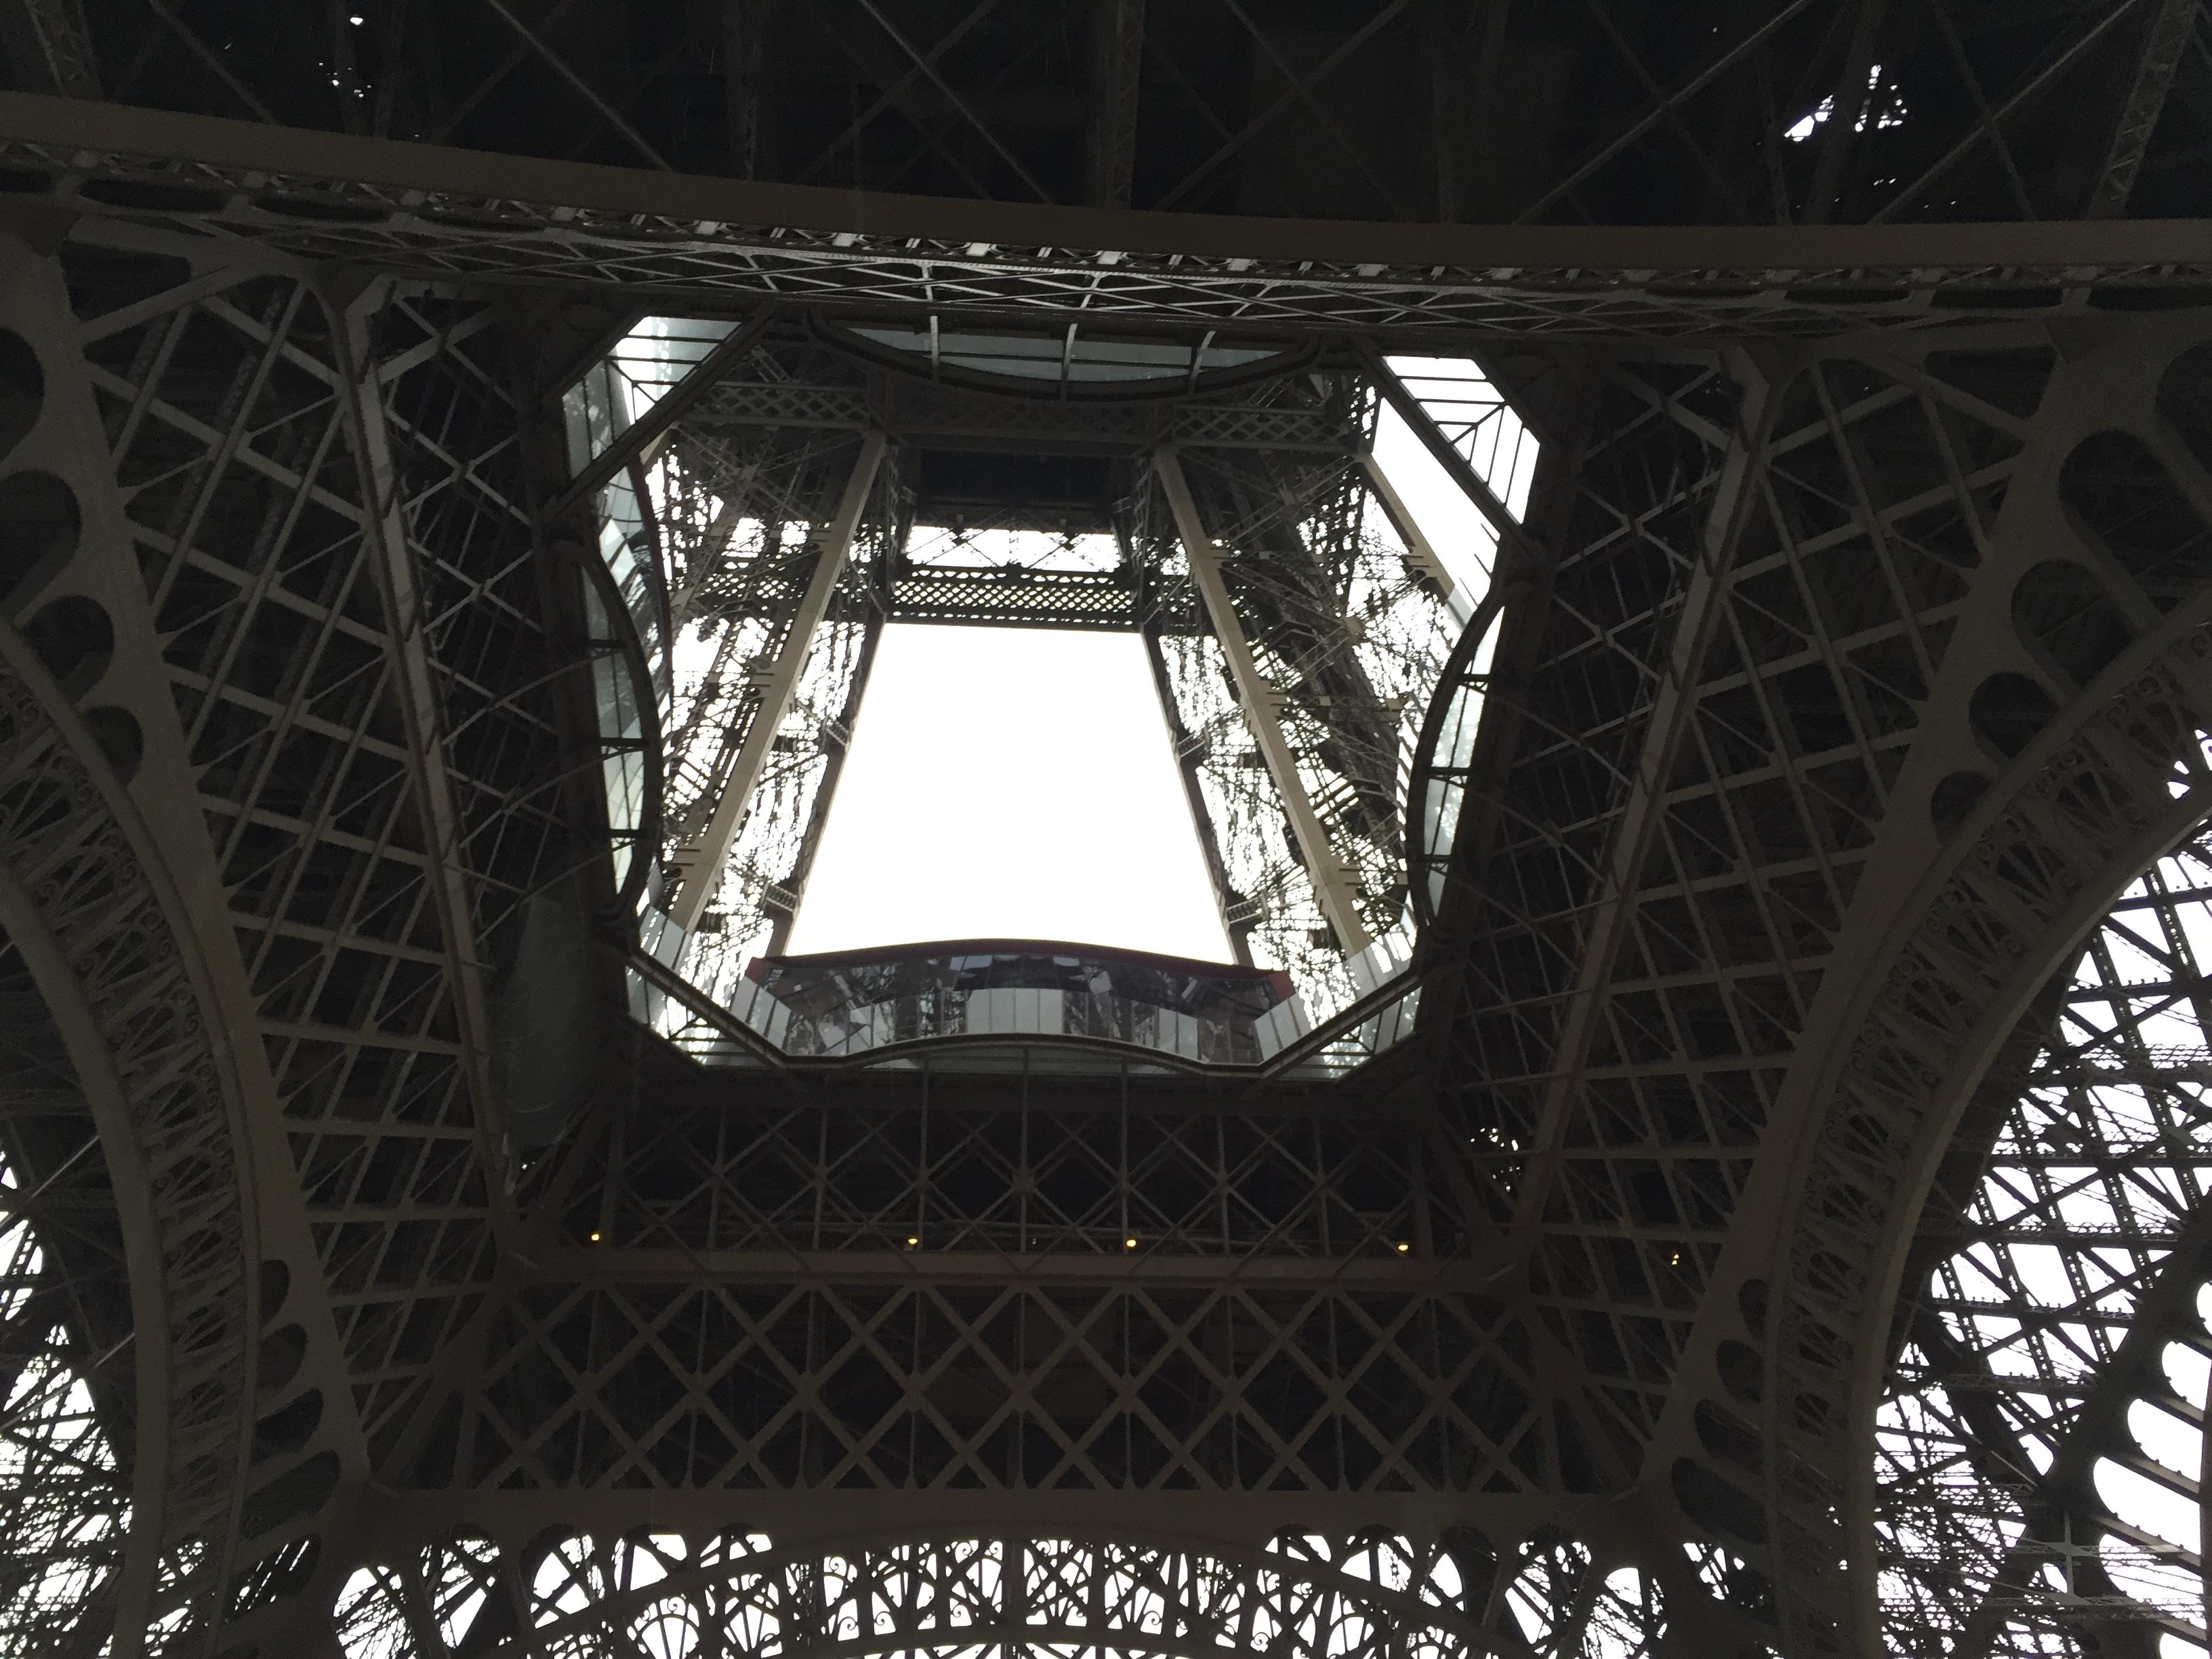 Eiffel Toewer, Paris